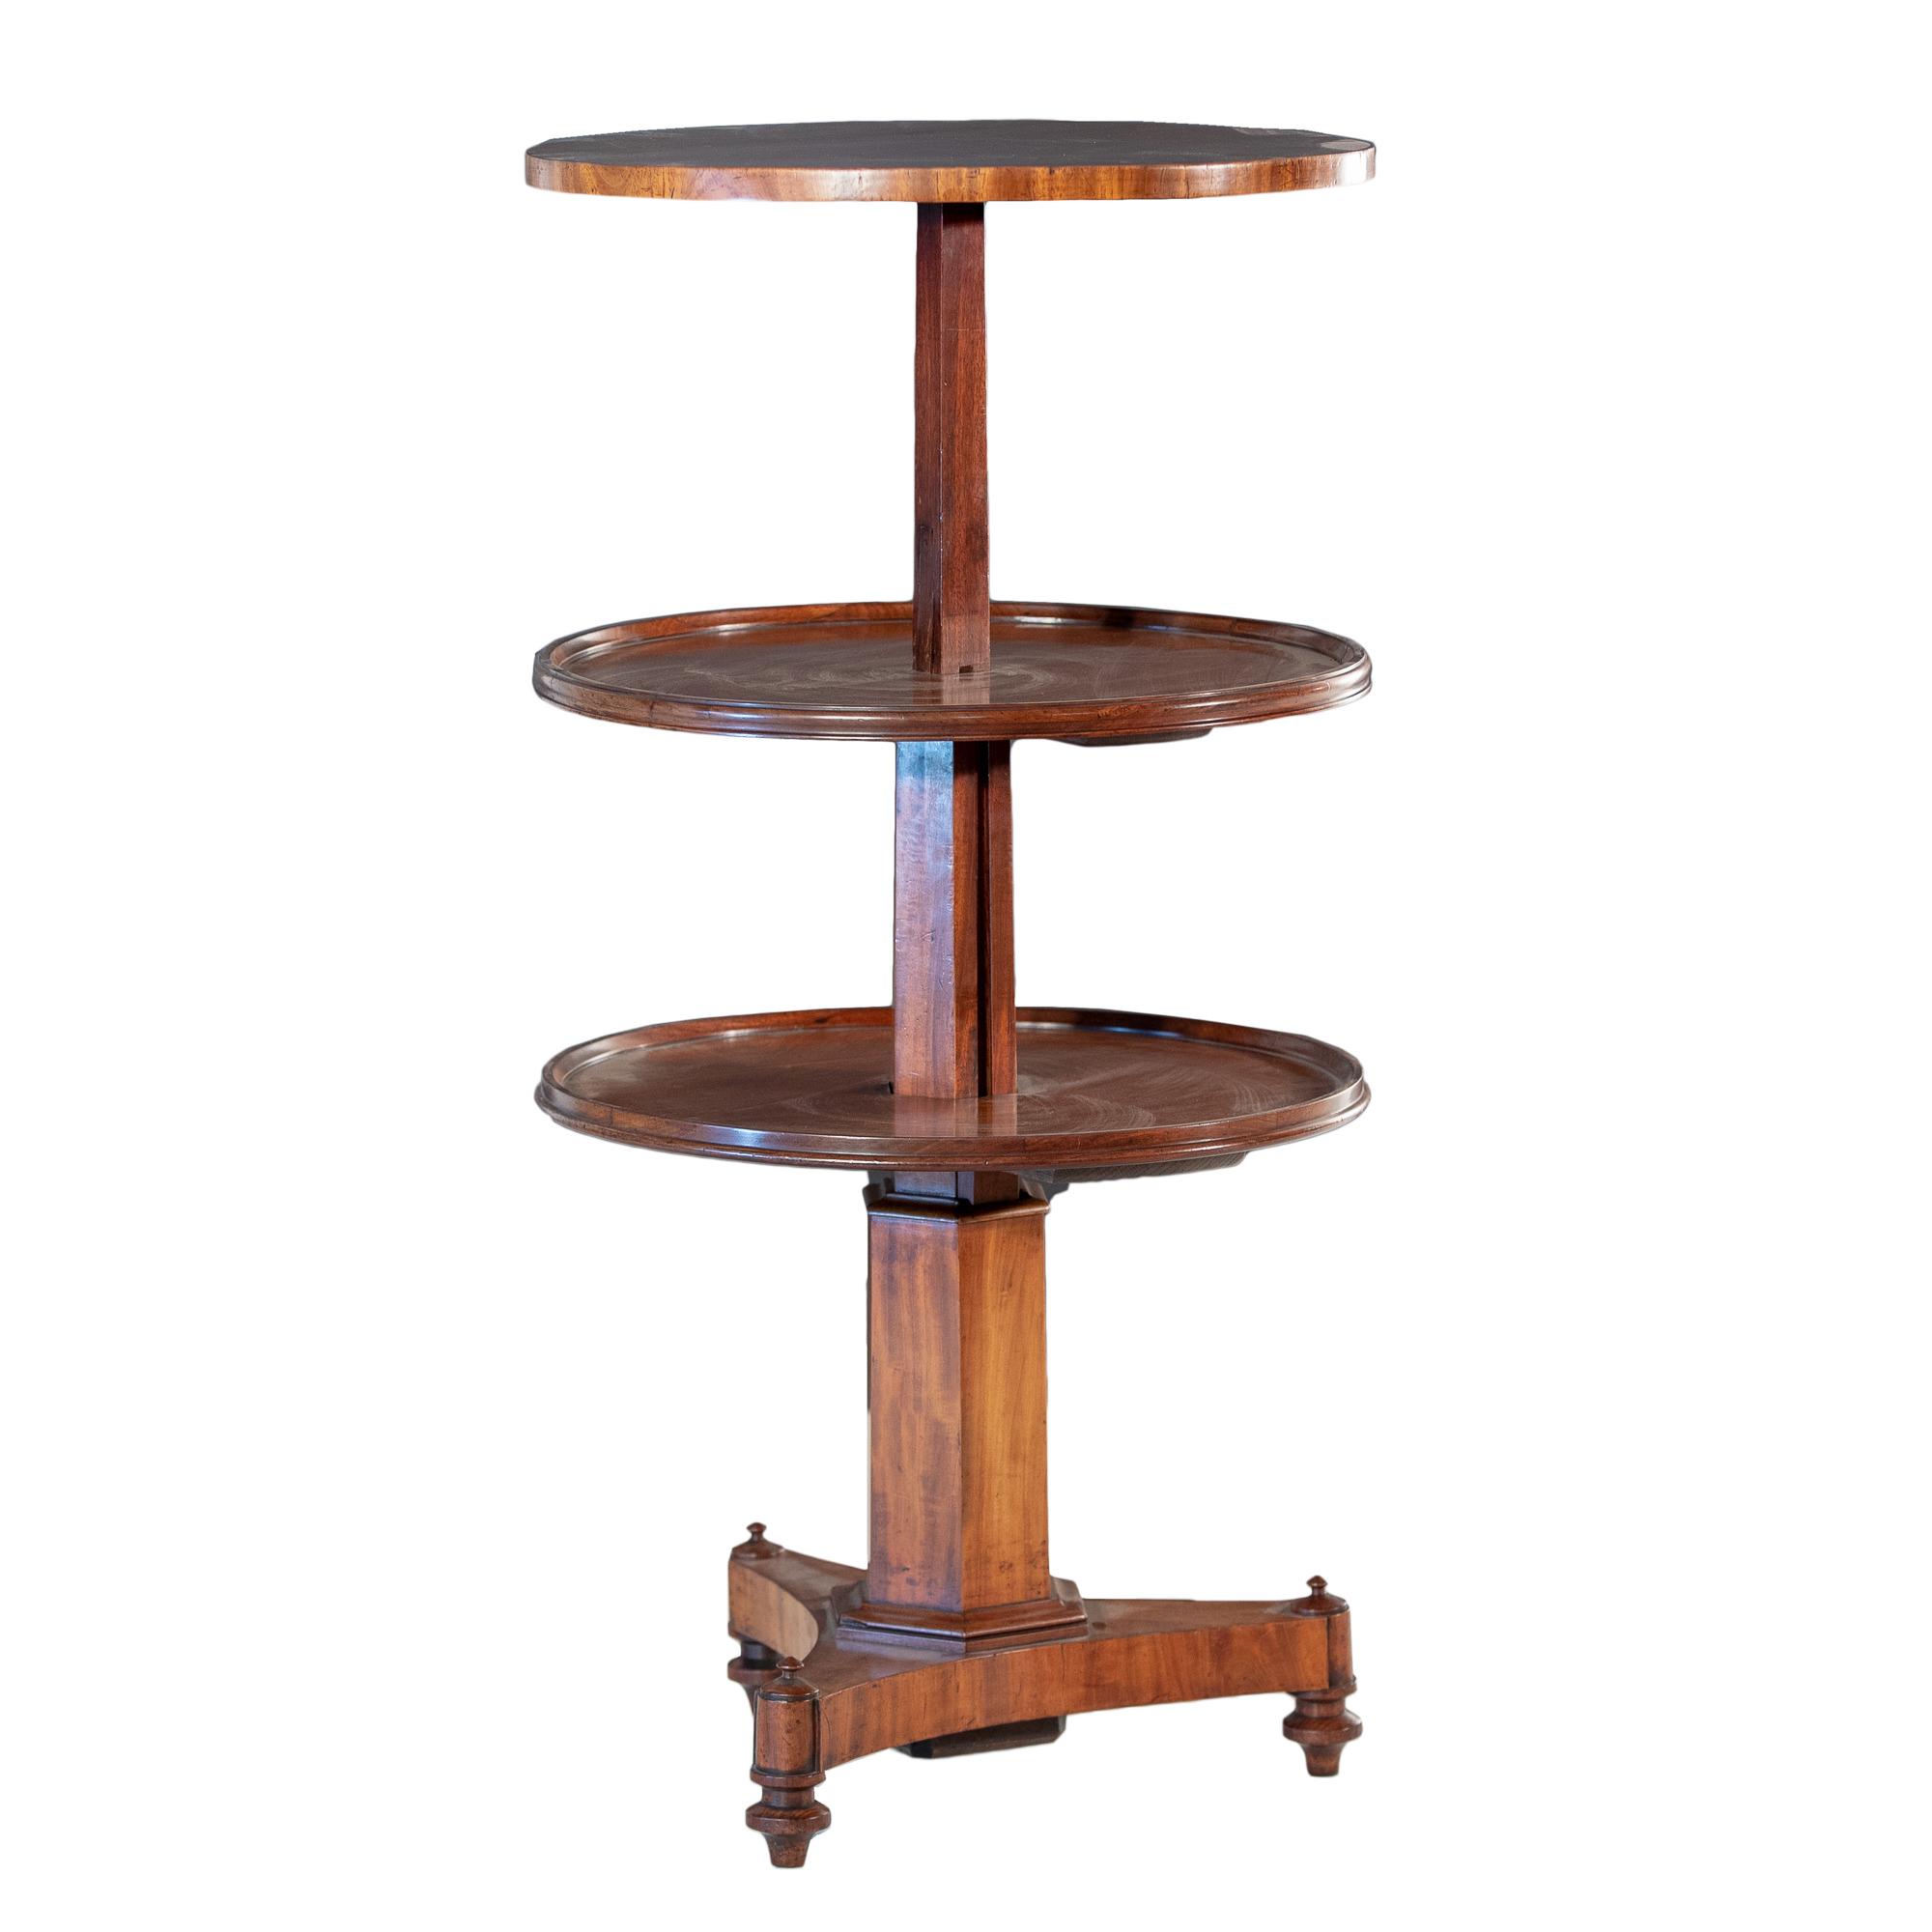 'William IV Mahogany Telescopic Dumbwaiter Wine Table with Faceted Column Circa 1835'